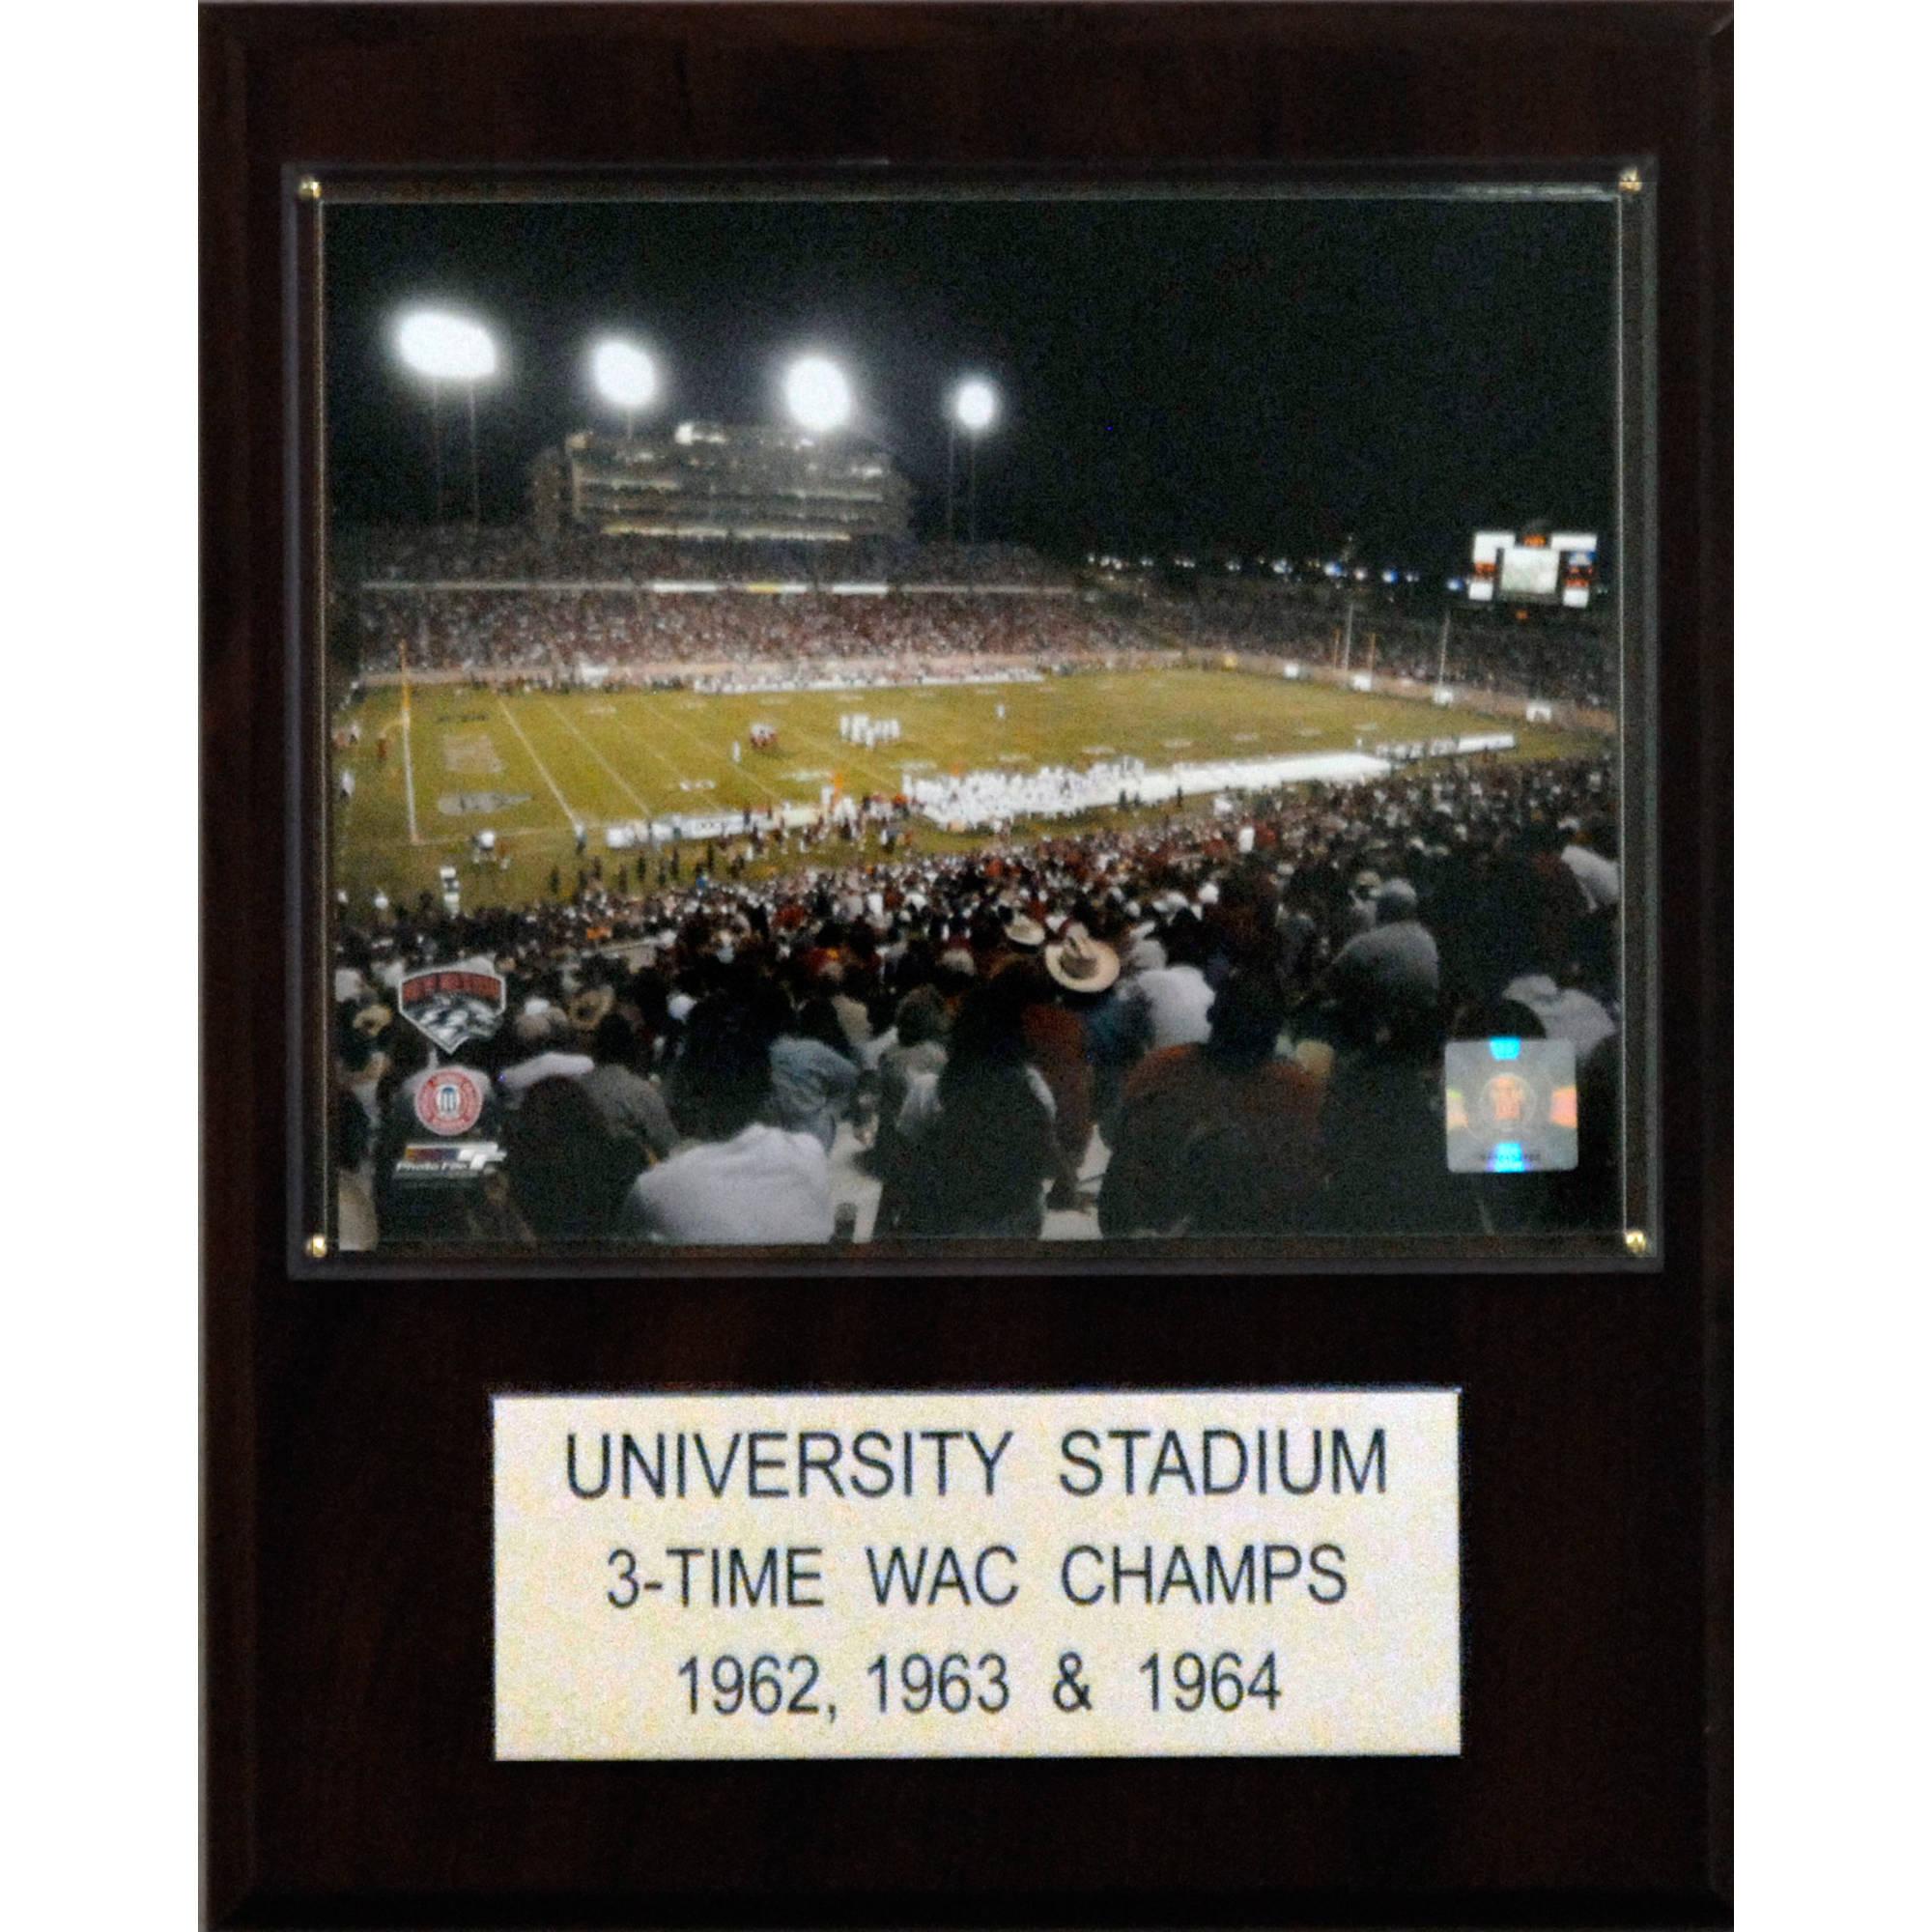 C&I Collectables NCAA Football 12x15 University Stadium Stadium Plaque